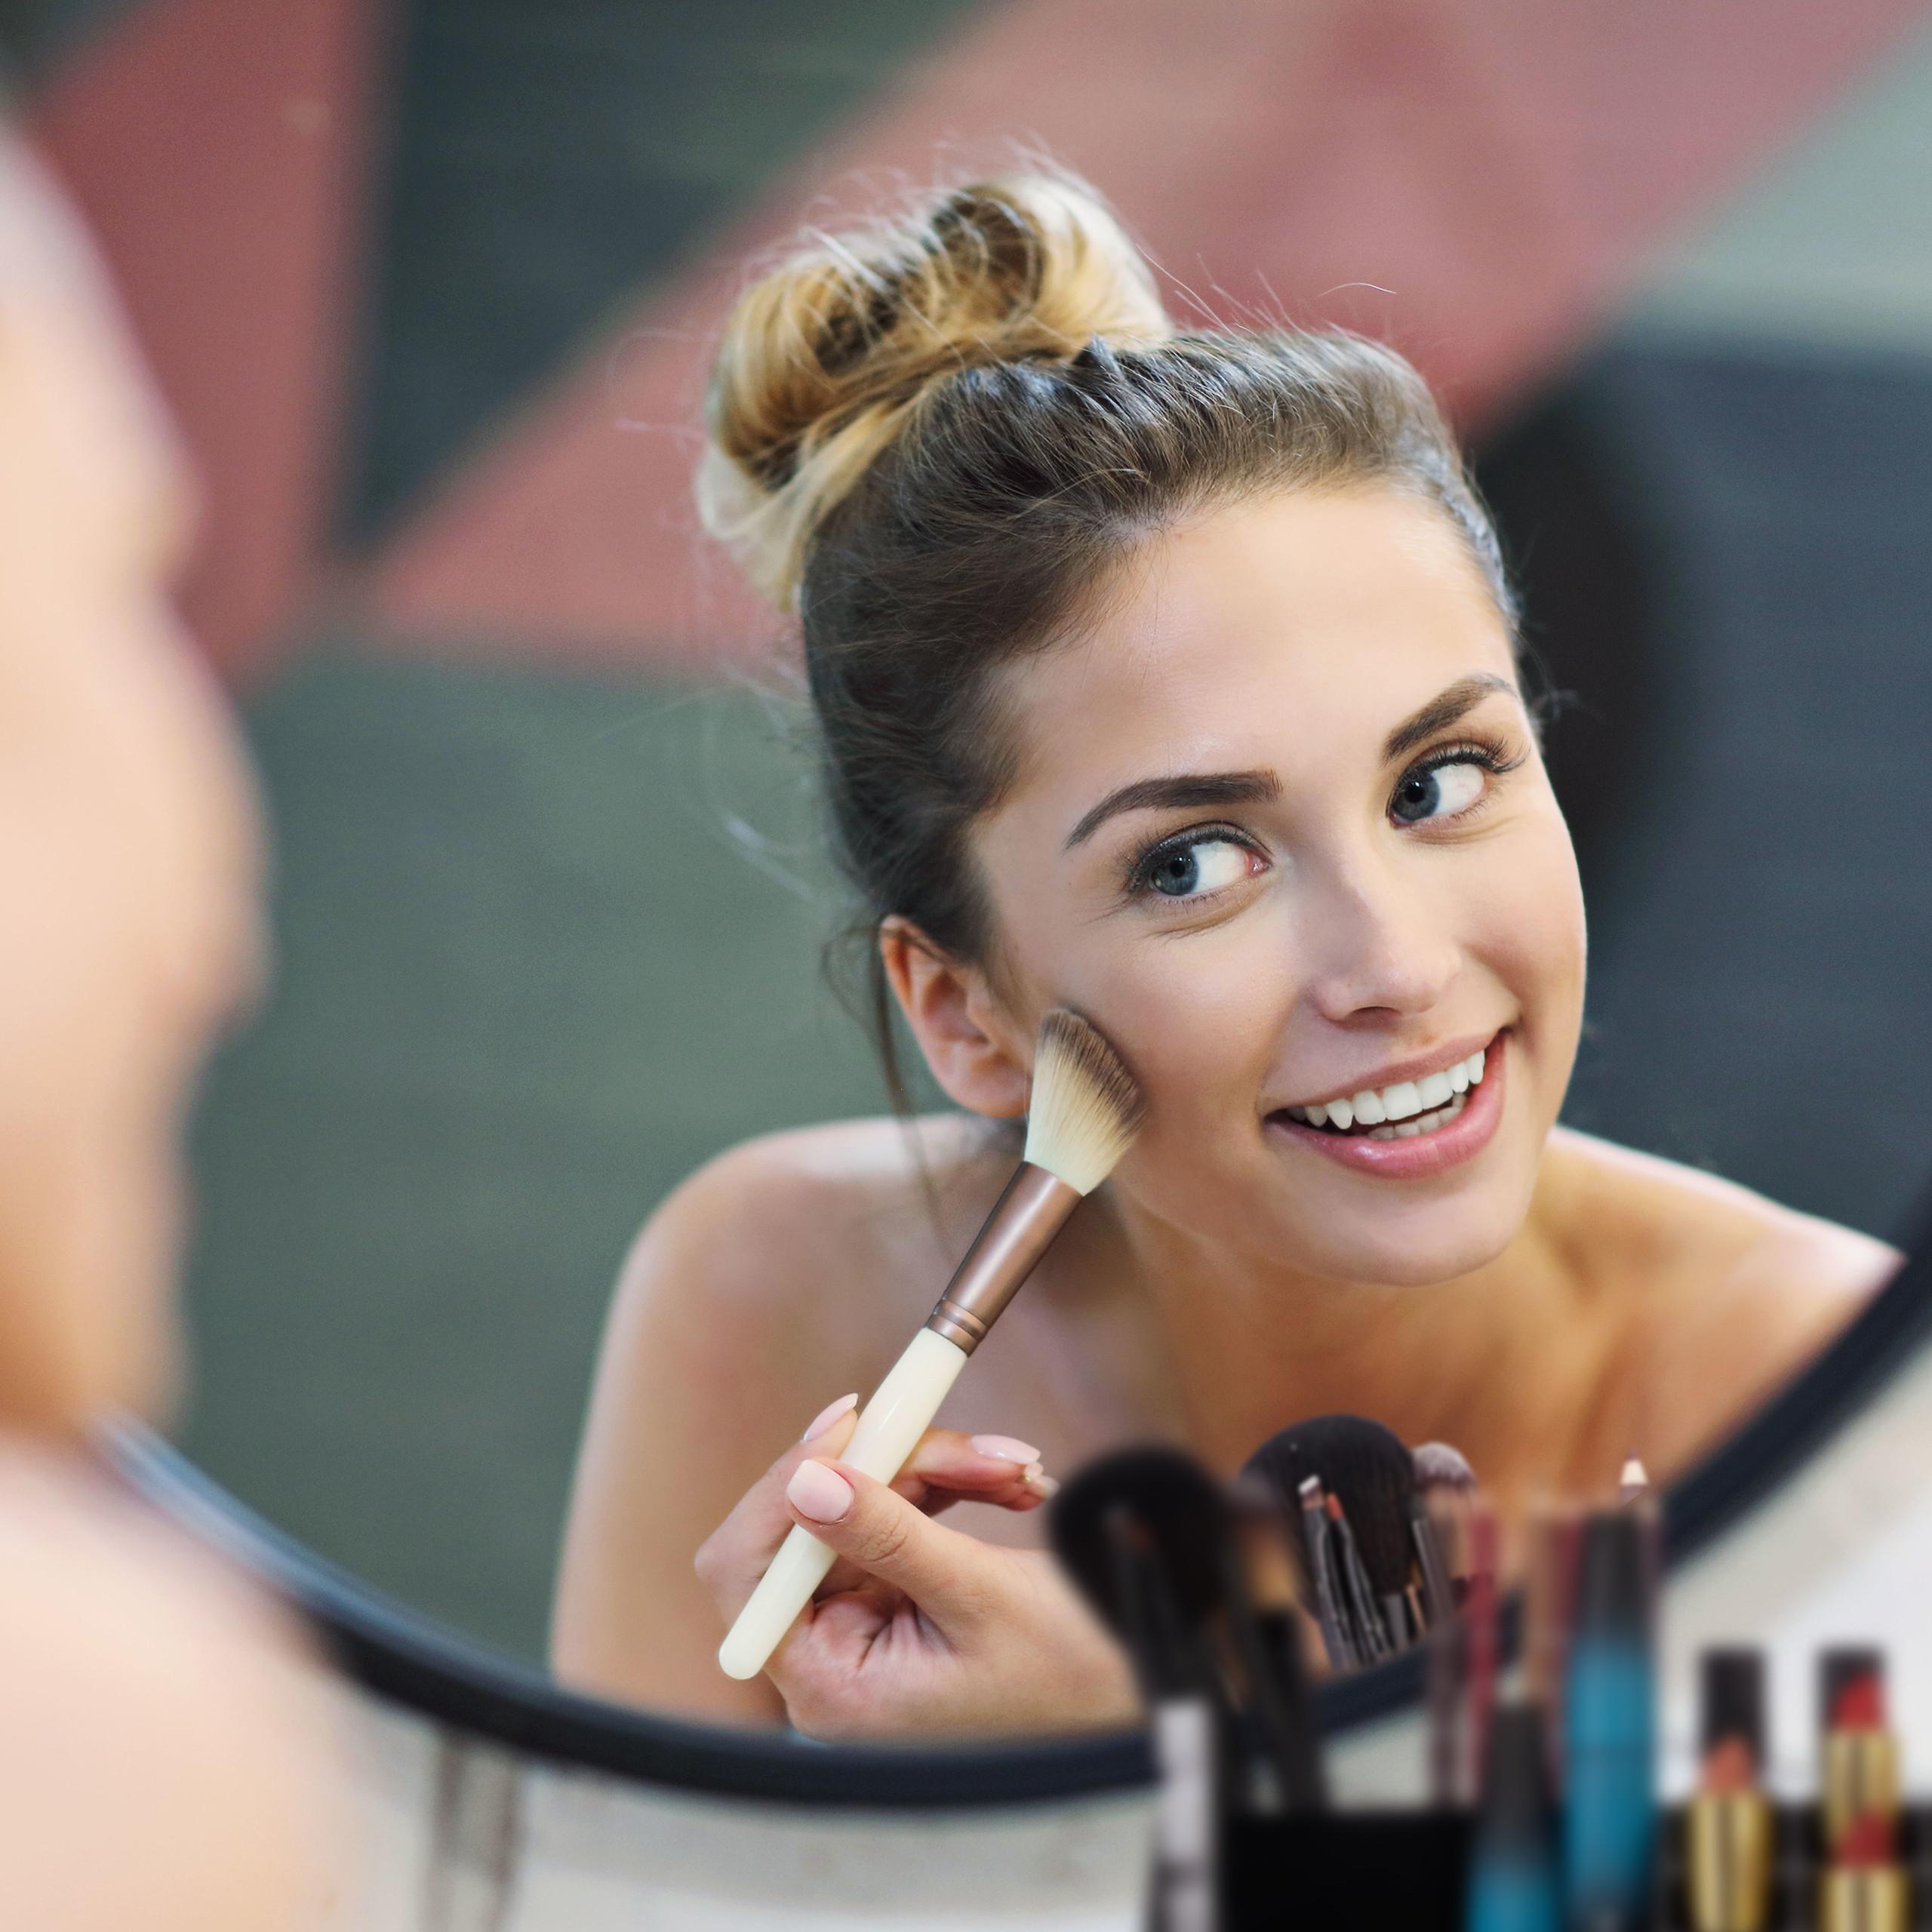 make-up-organizer-met-6-lades-acryl-cosmeticahouder-make-up-cosmetica-opslag miniatuur 23